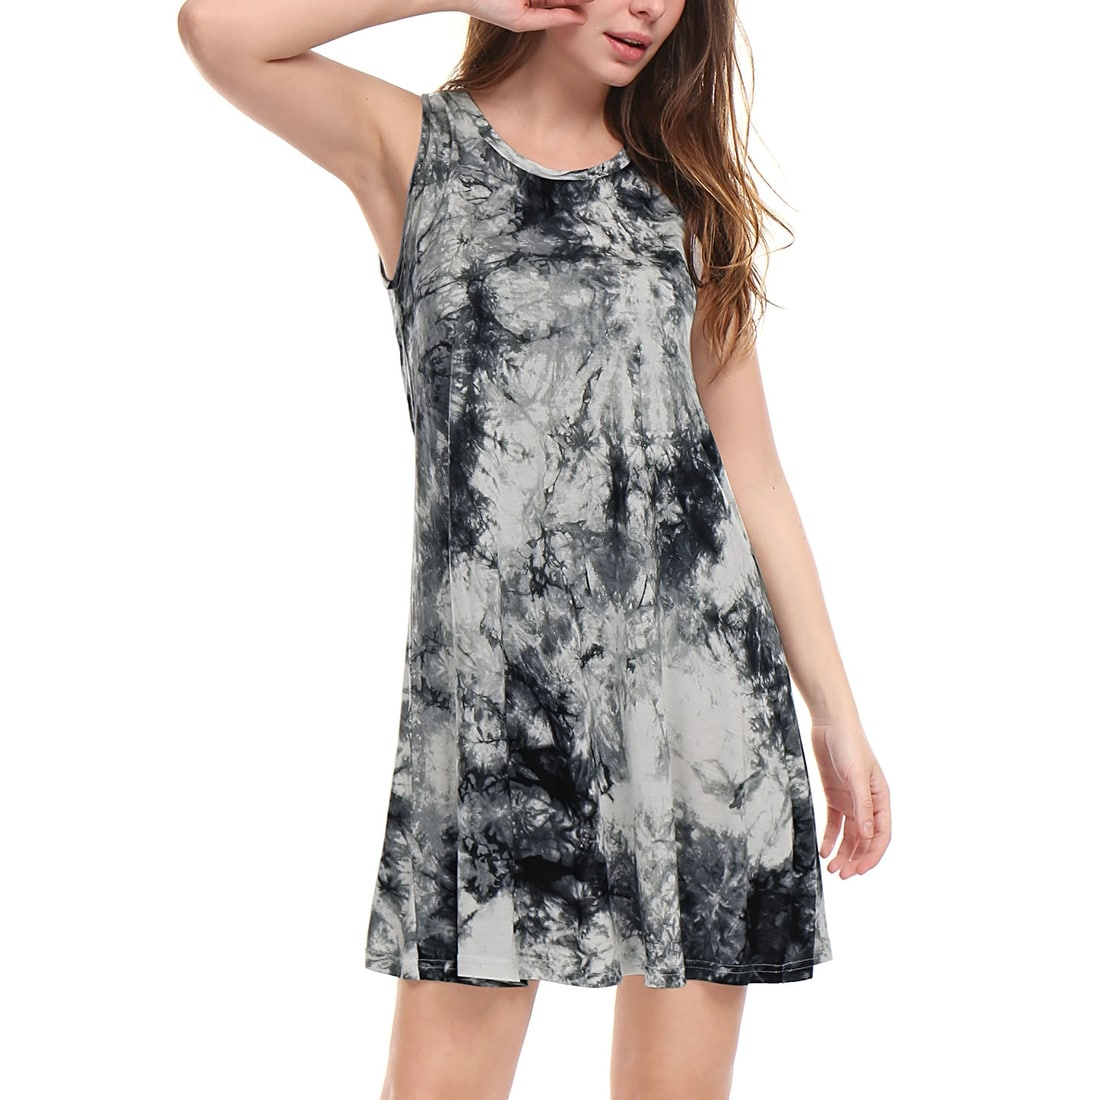 Aleumdr Womens Summer Sleeveless Crewneck Tie Dye Side Tie Dress Above Knee